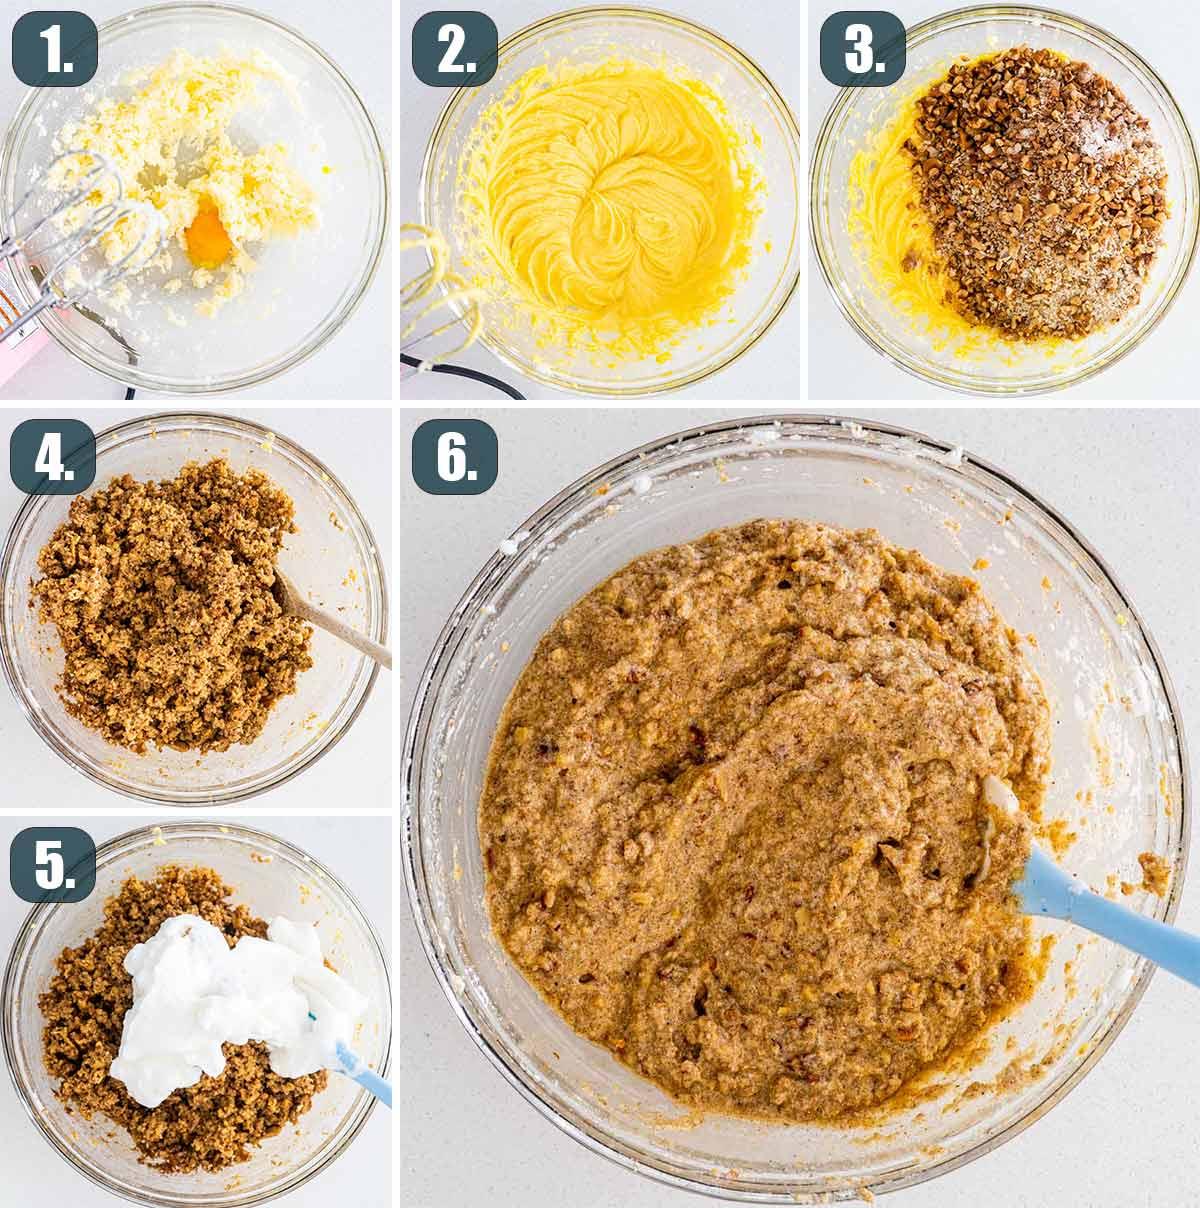 process shots showing how to make batter for karydopita.